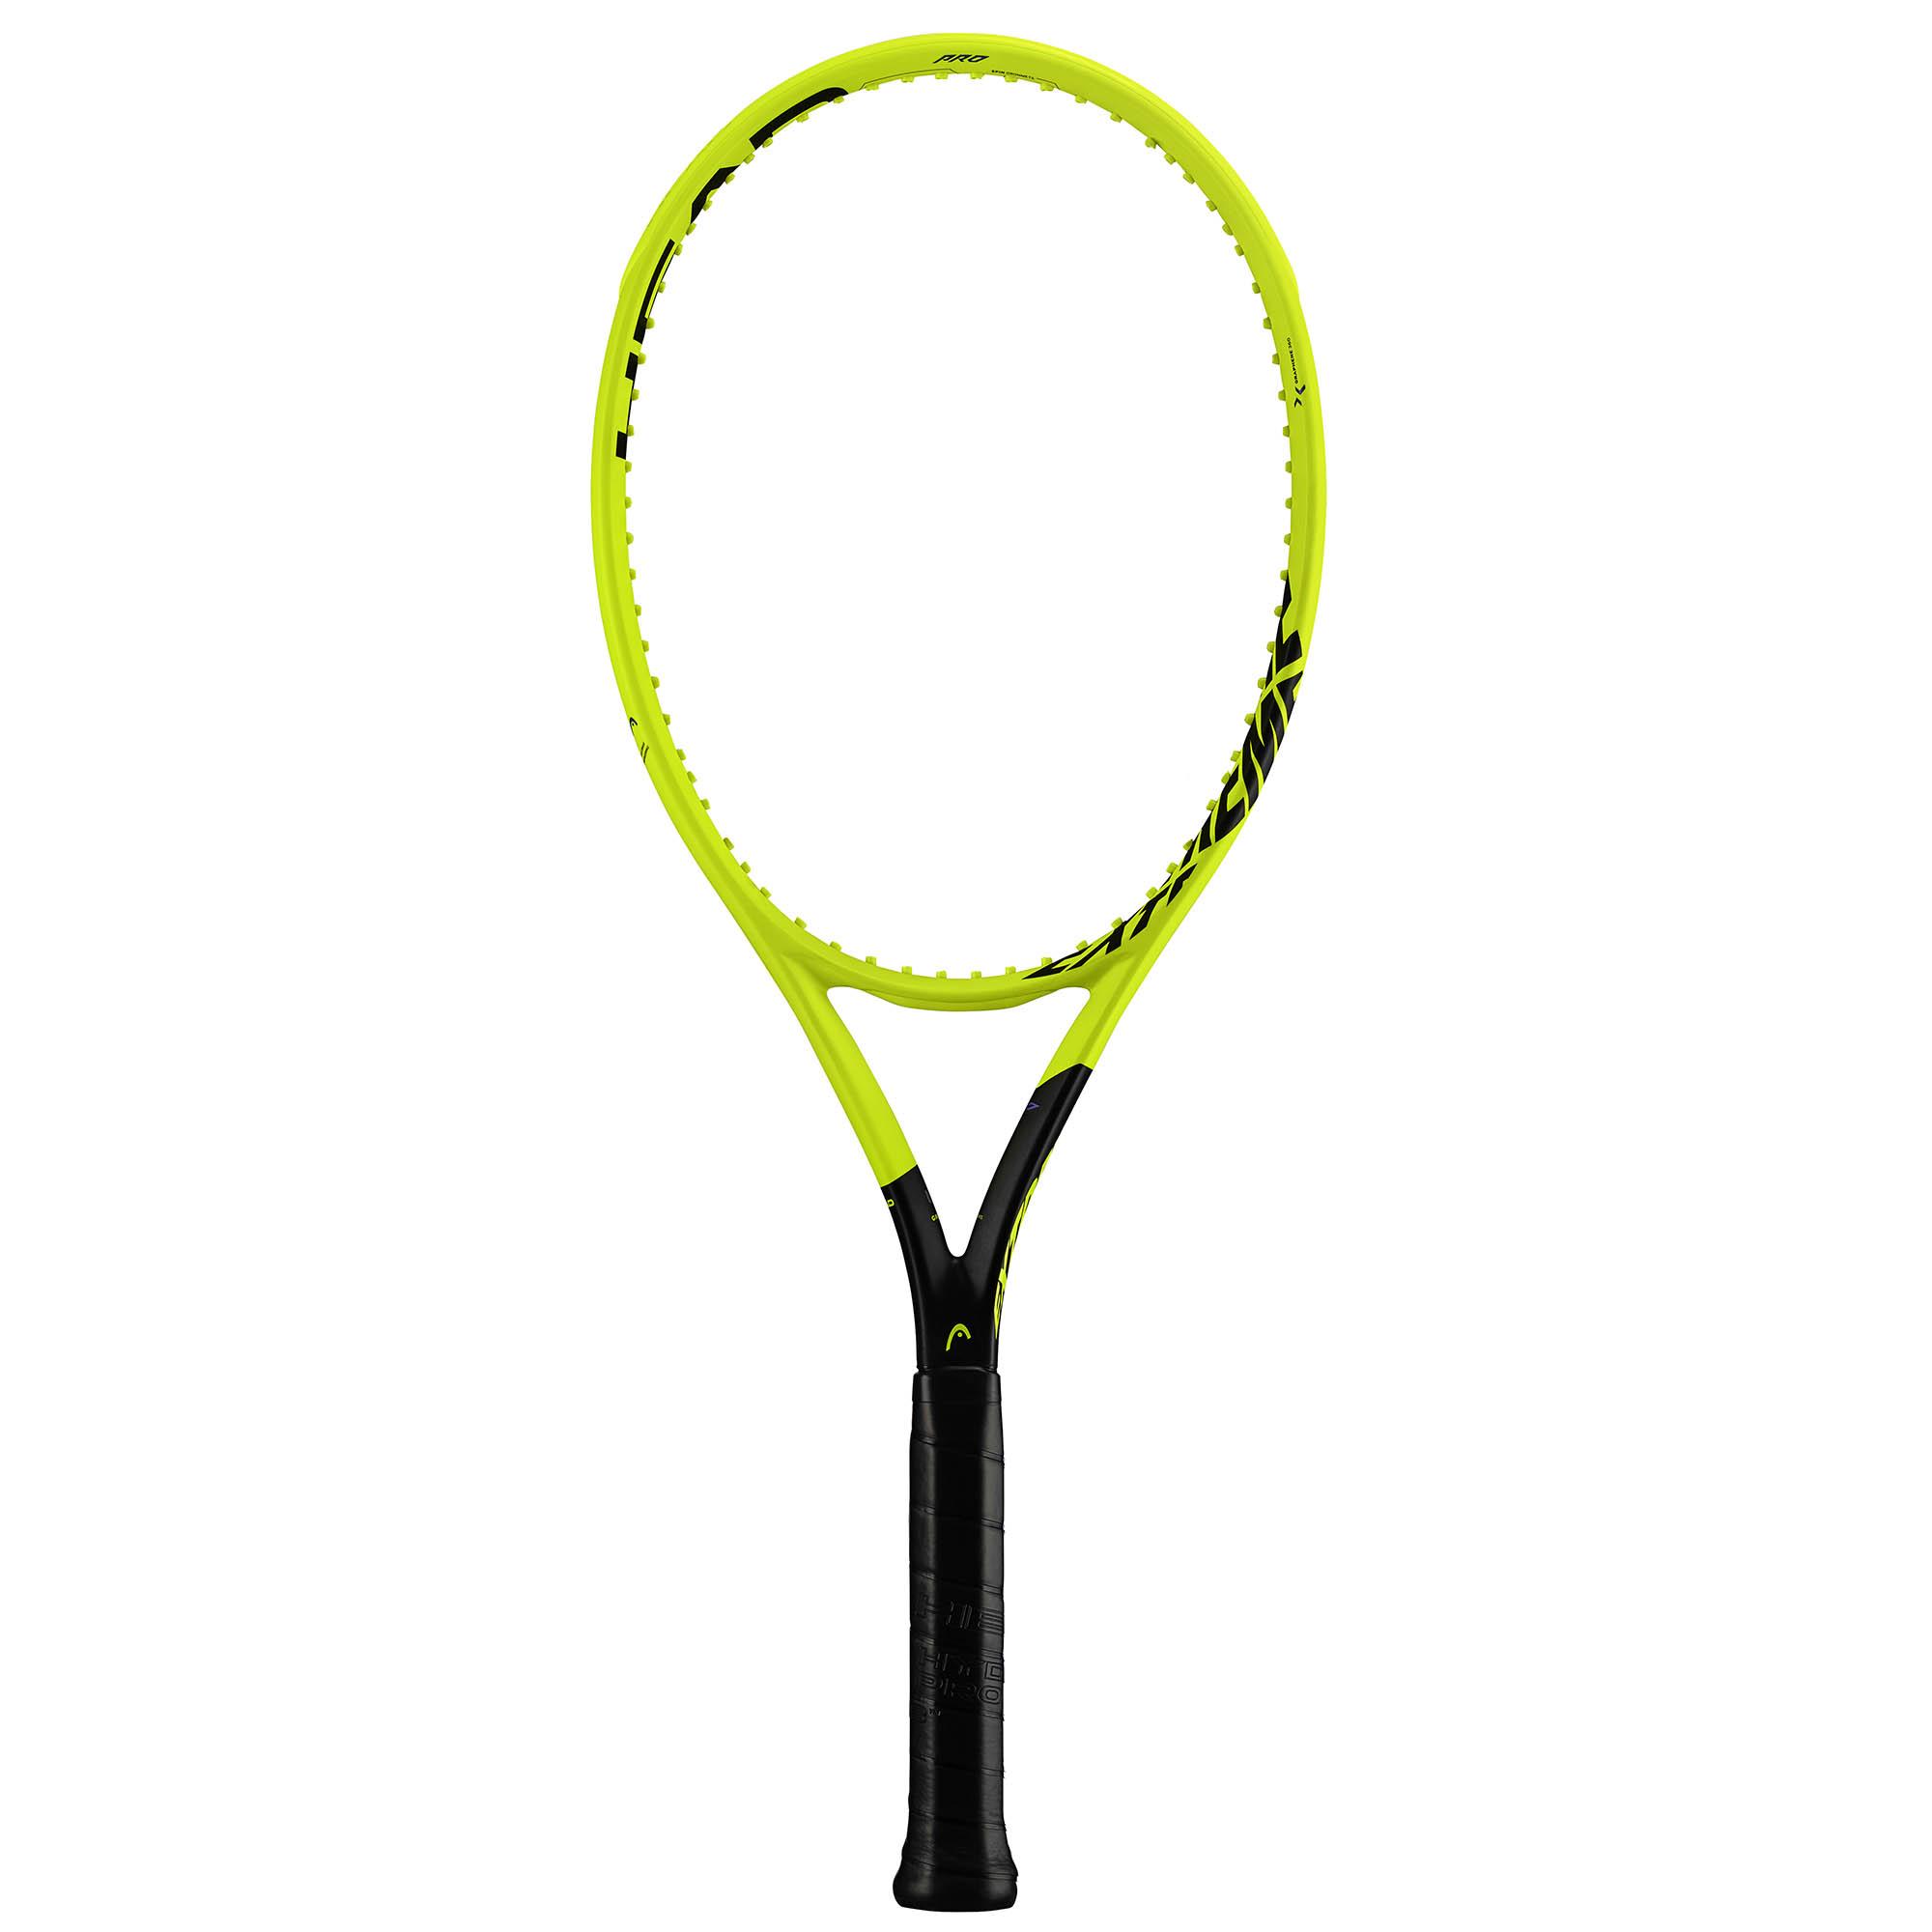 Head Graphene 360 Extreme PRO Tennis Racket - Grip 2